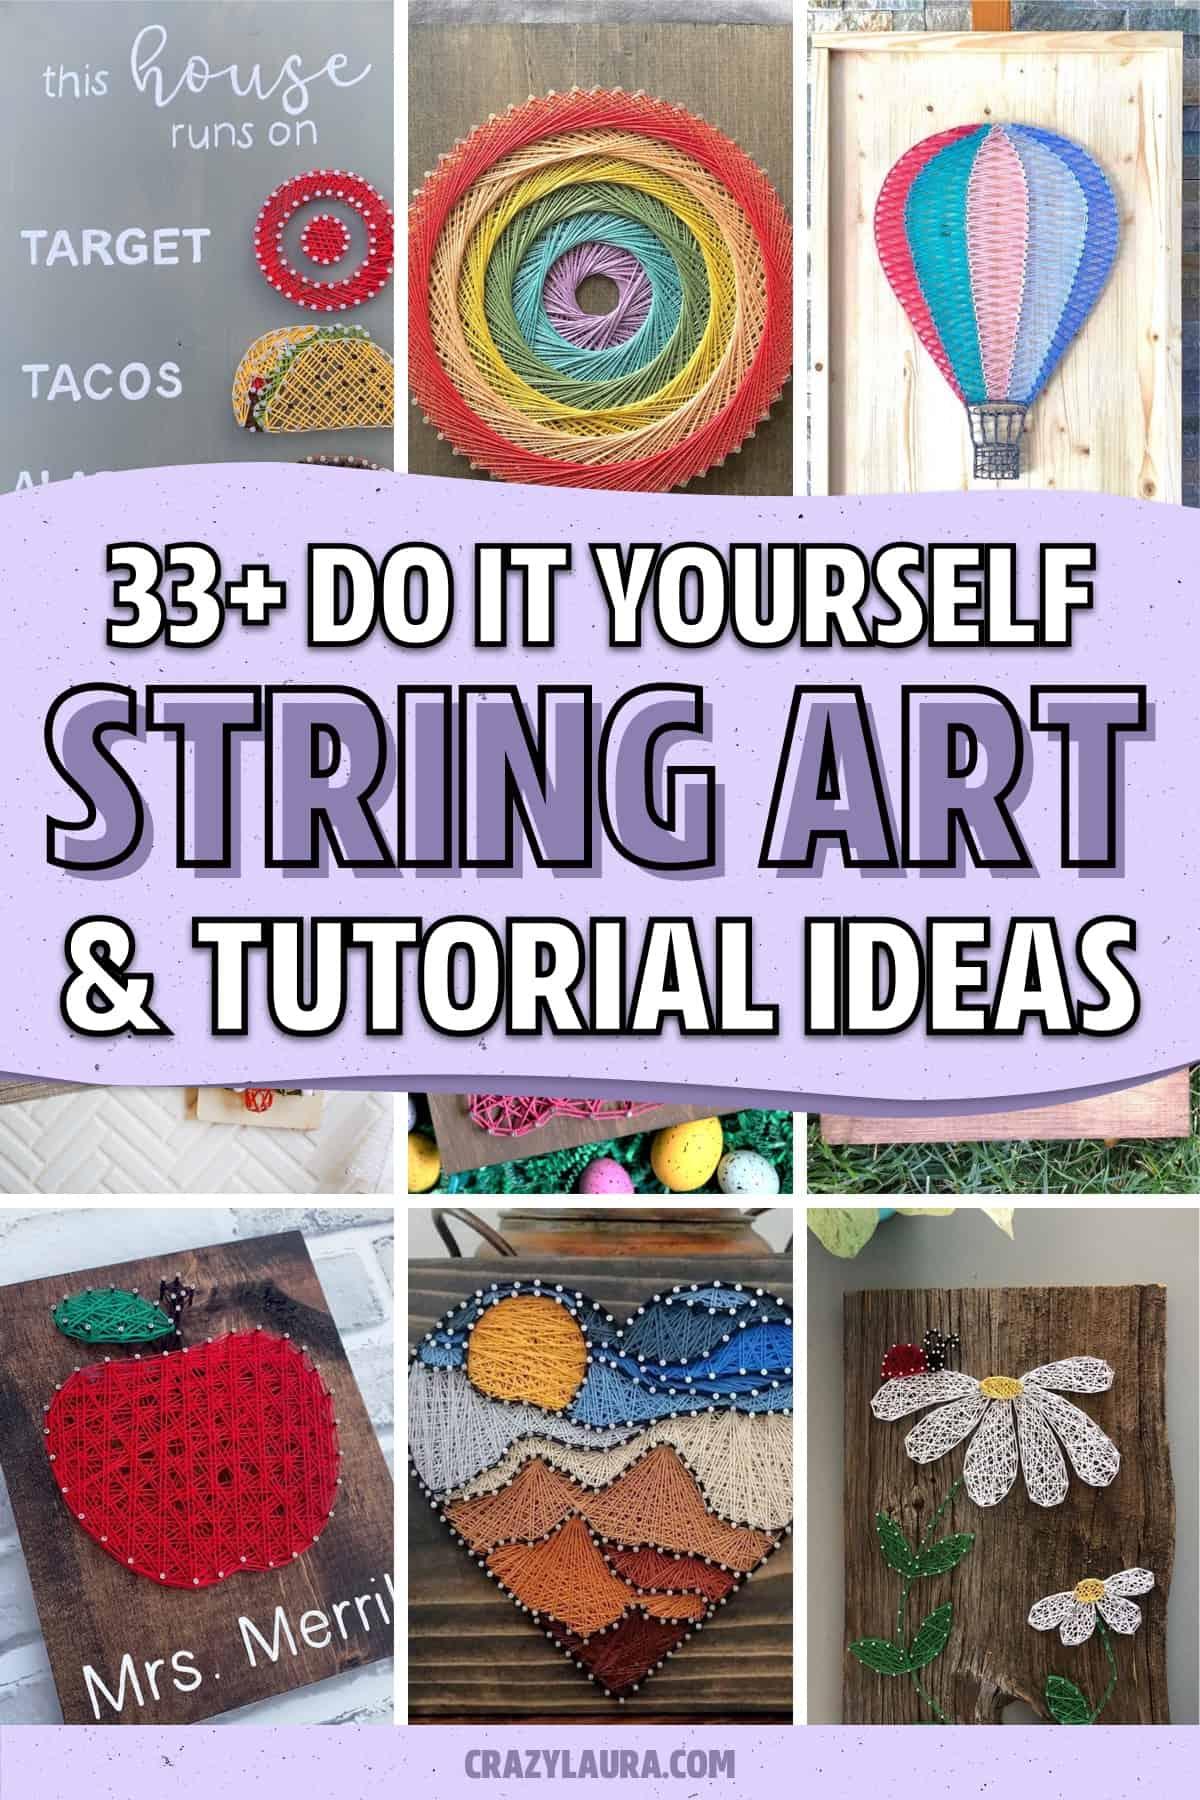 nail and string art ideas